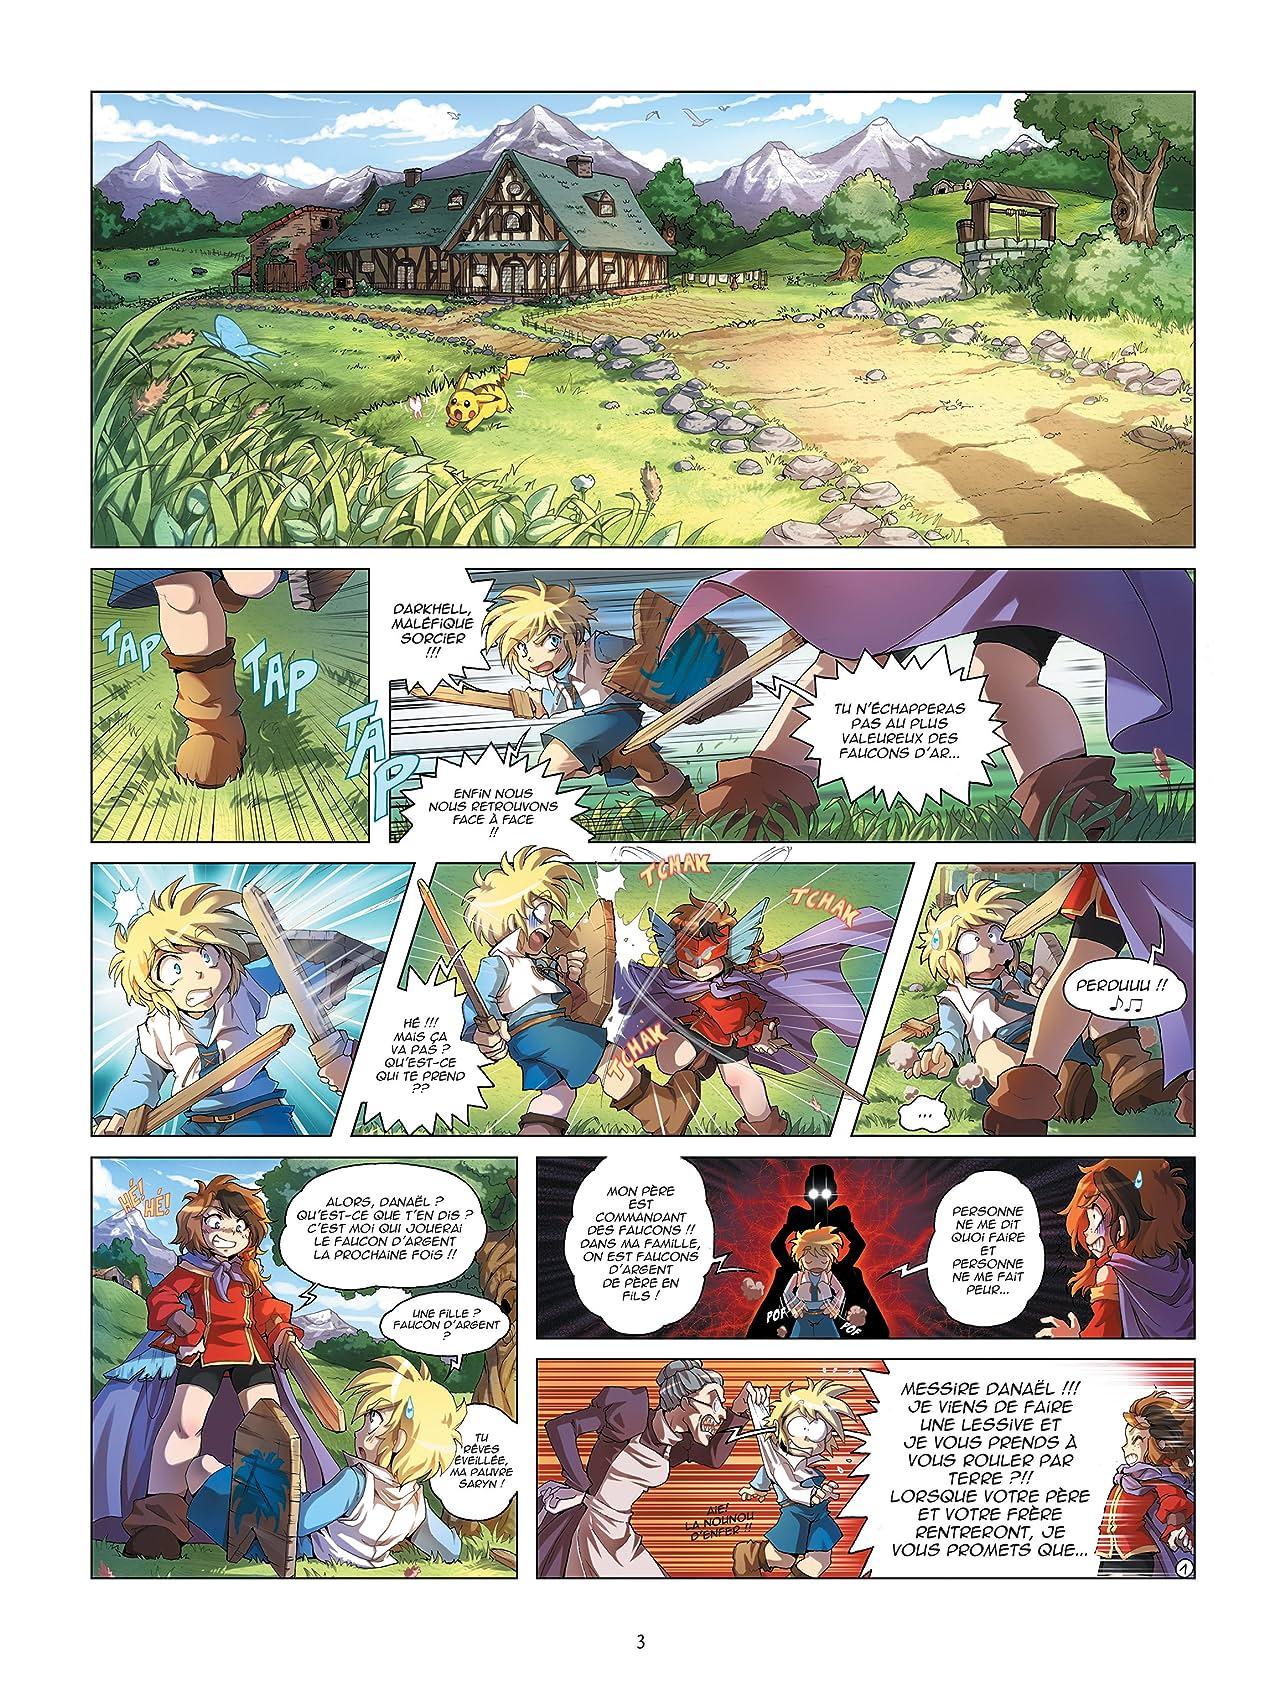 Les Légendaires - Origines Vol. 1: Danaël